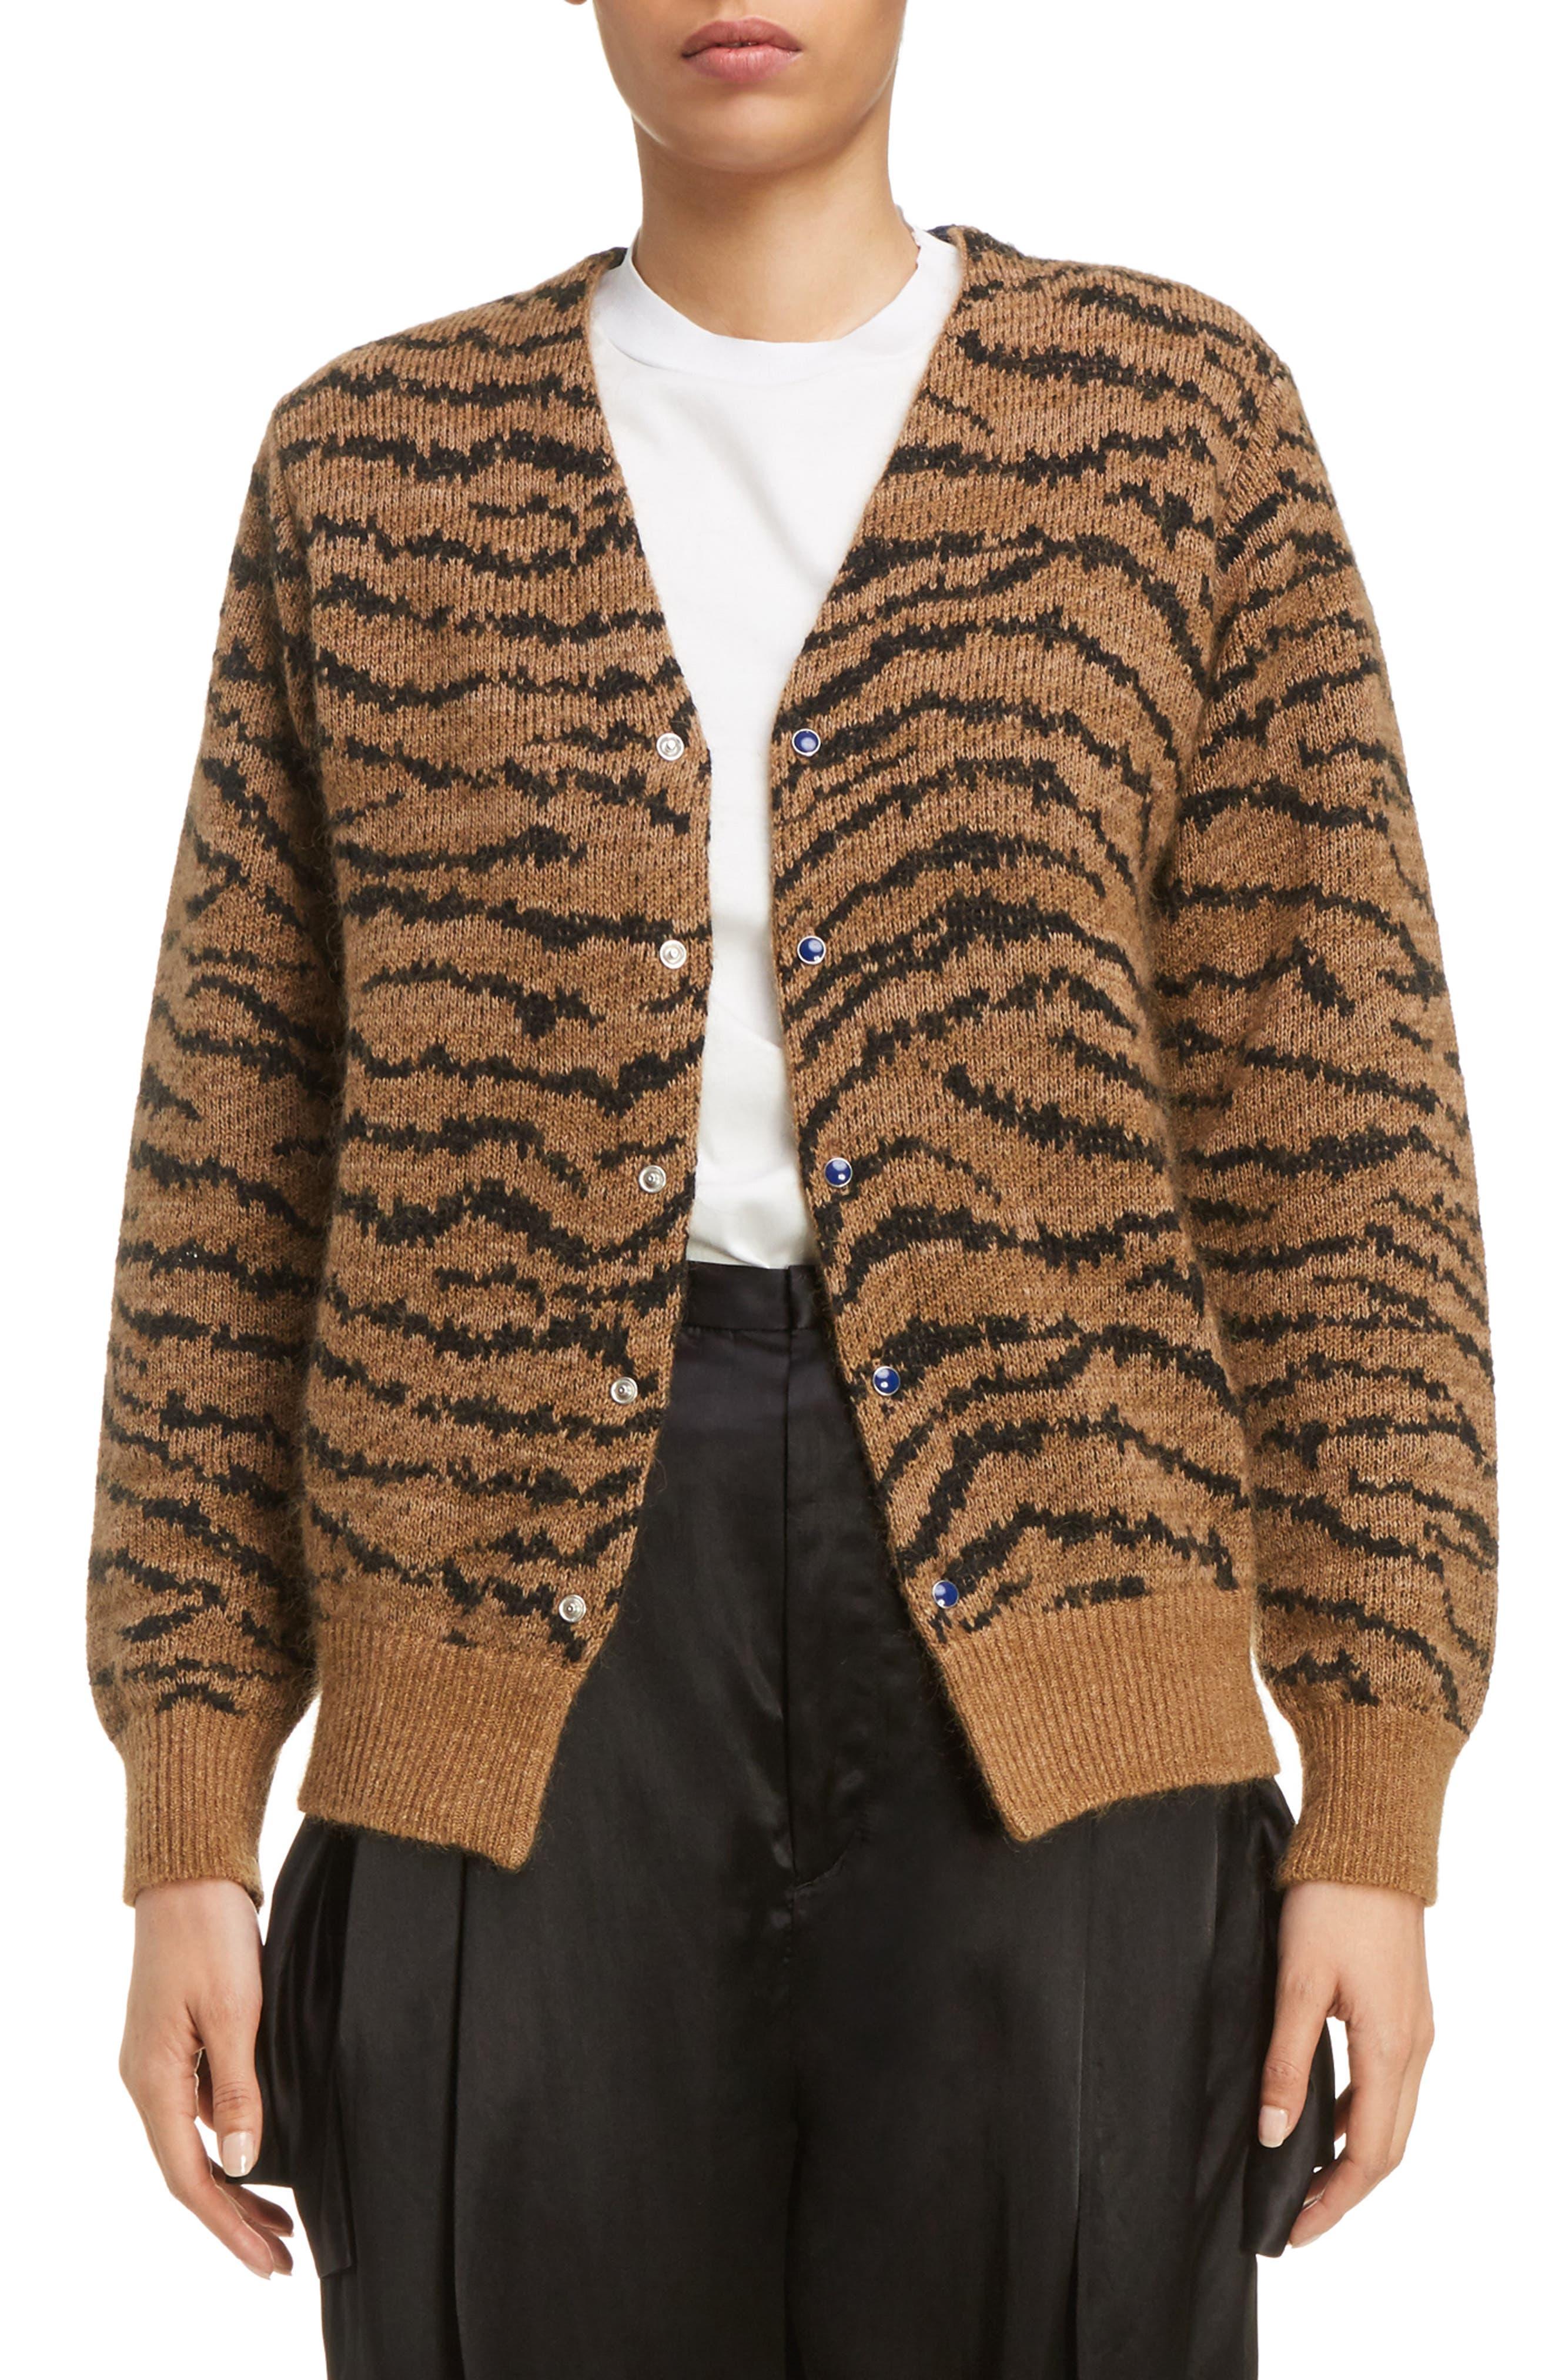 Tiger Jacquard Knit Button Cardigan,                             Main thumbnail 1, color,                             250